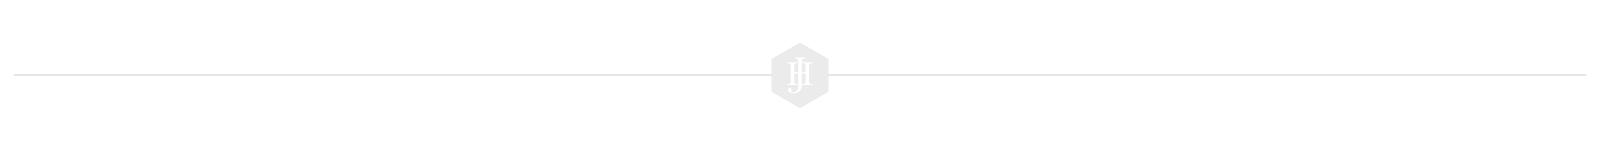 JH monogram line@2x-100.jpg